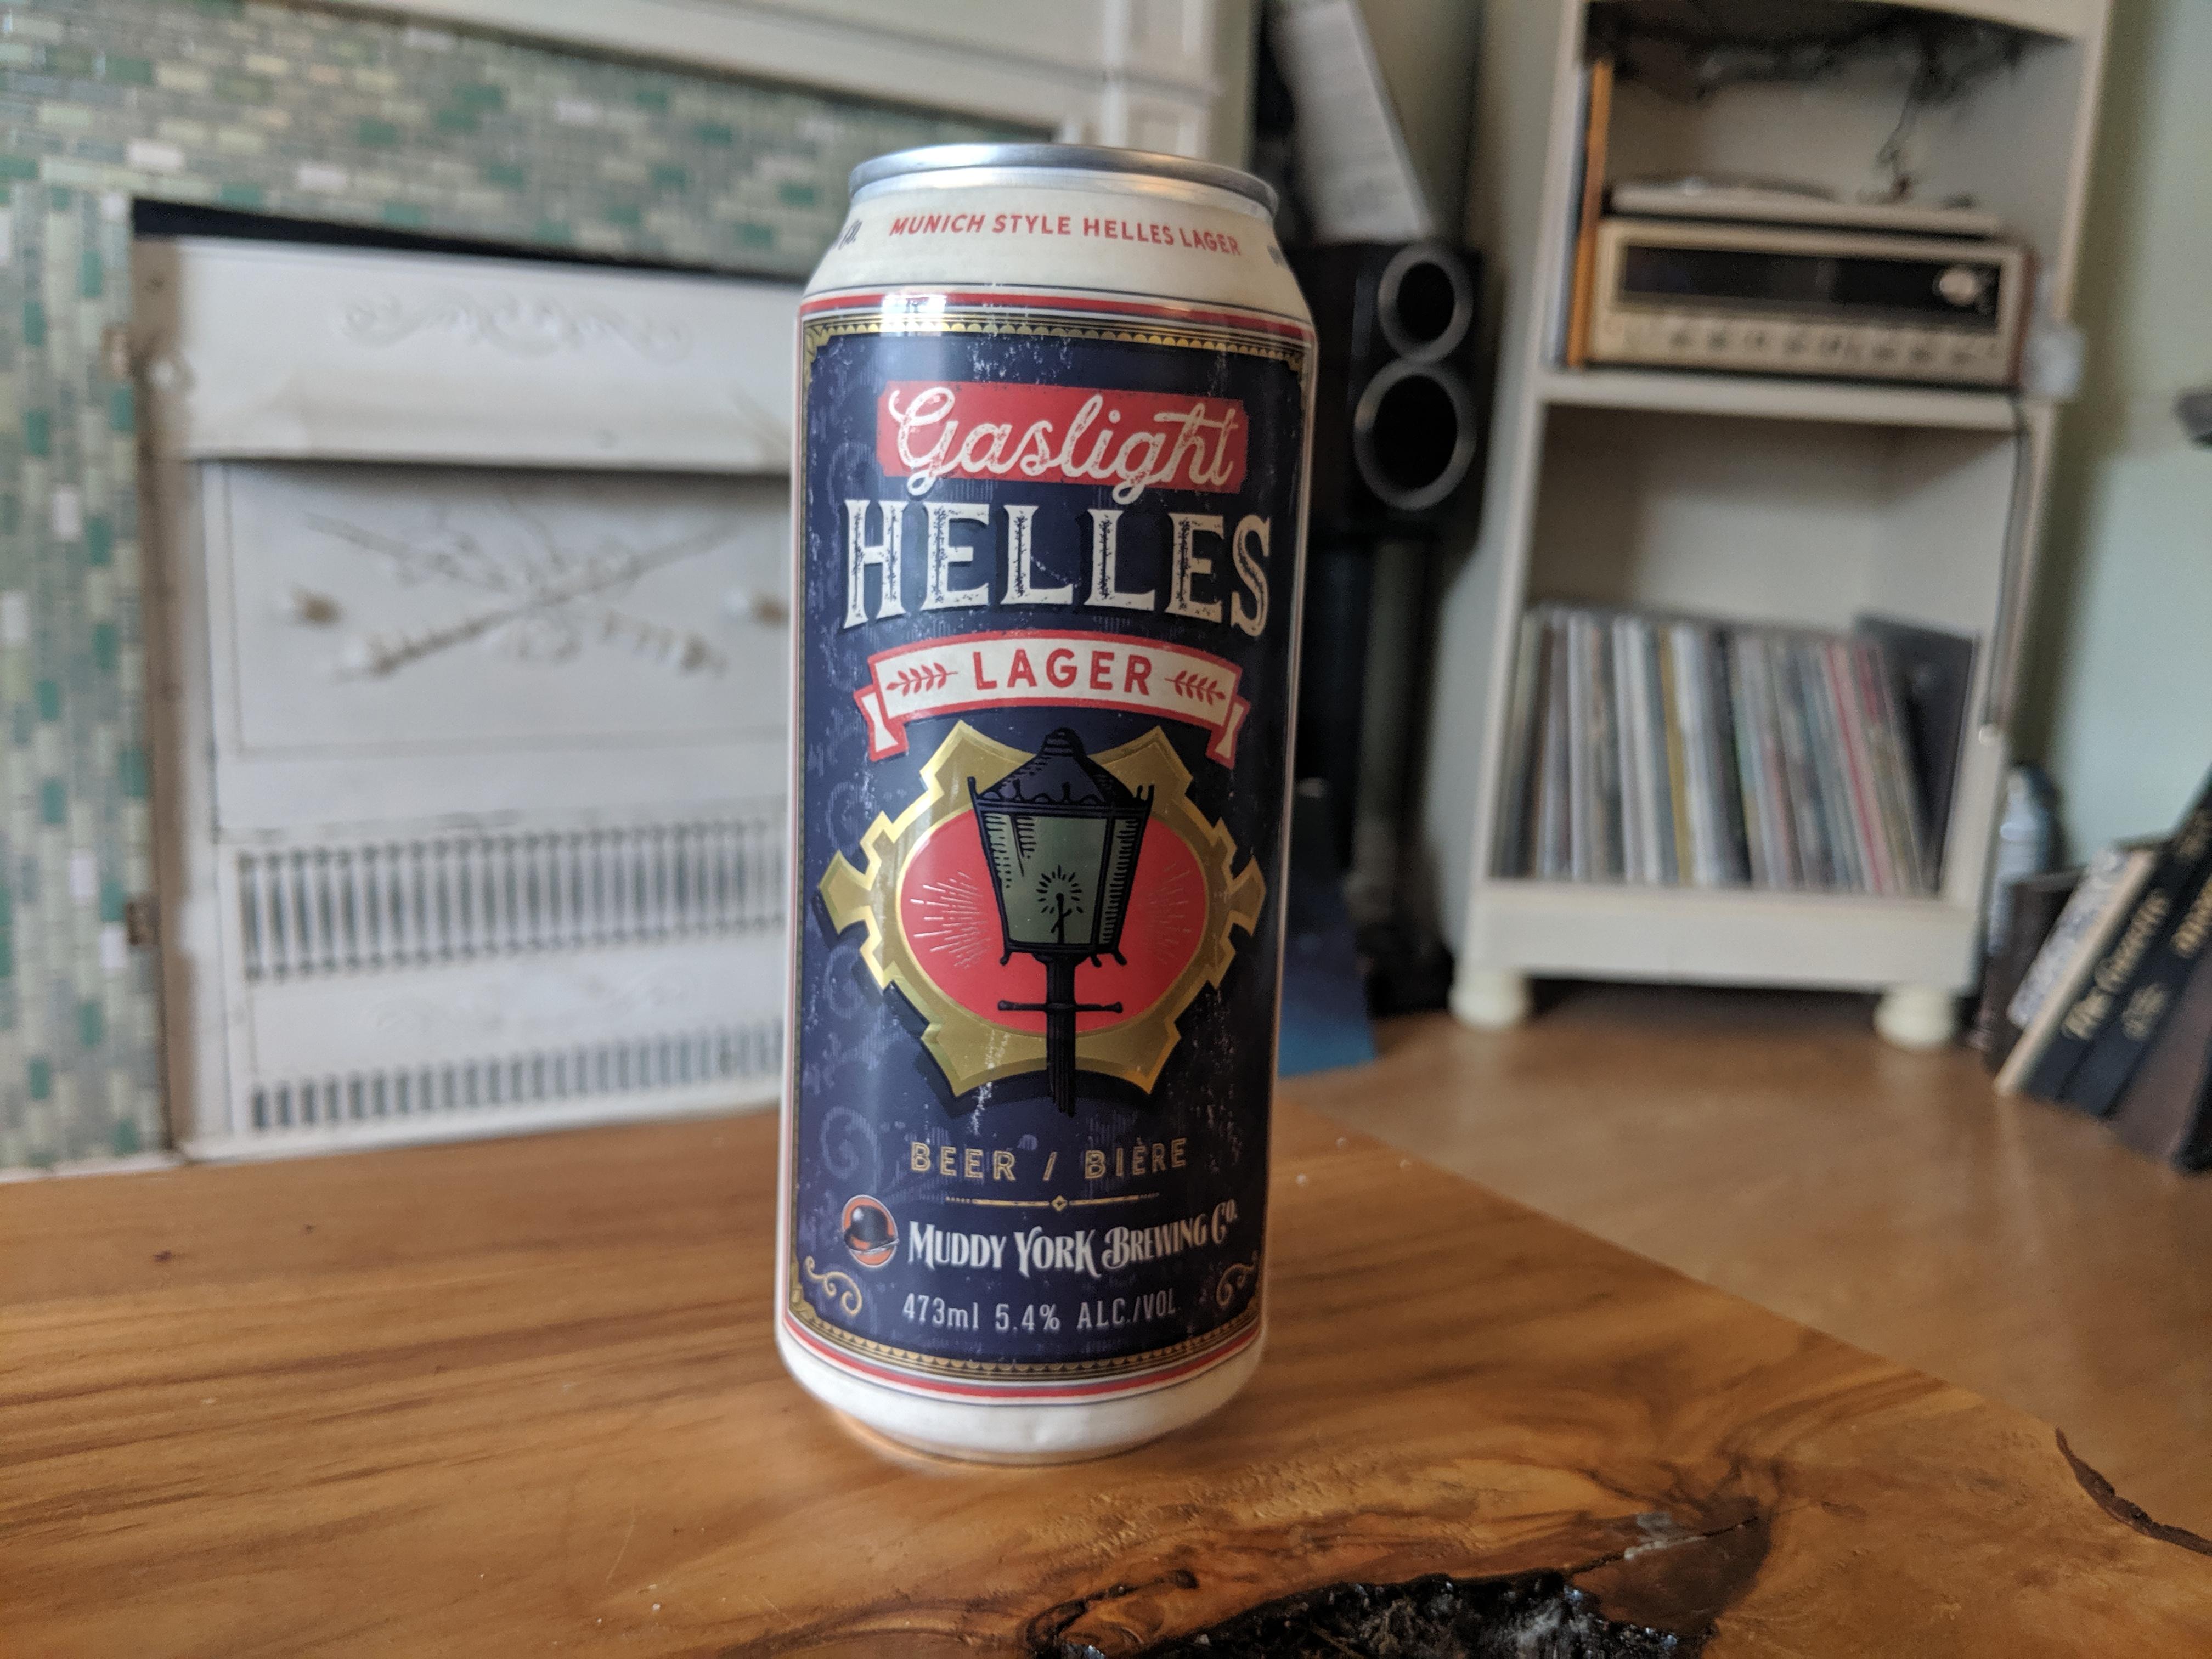 Muddy York's Gaslight Helles Lager is Hella Tasty